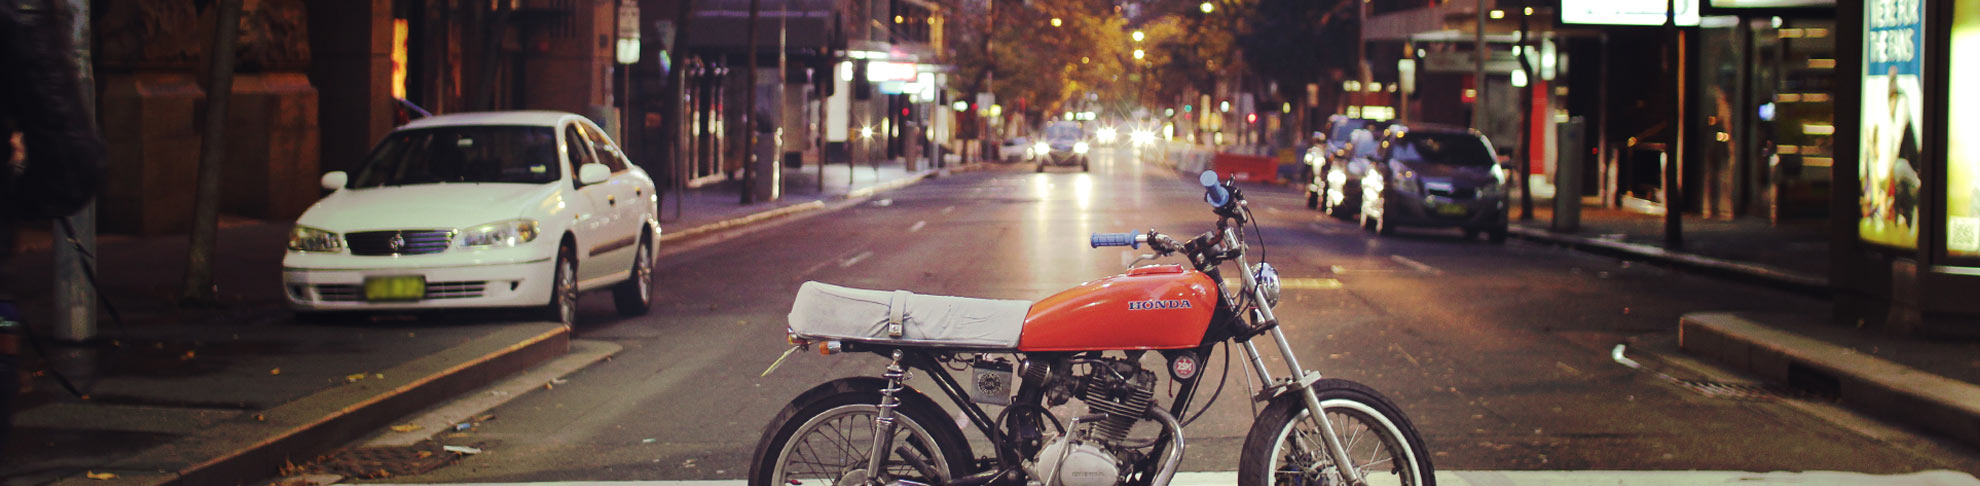 Stories_Of_Bike_BackgroundHeader_4.jpg